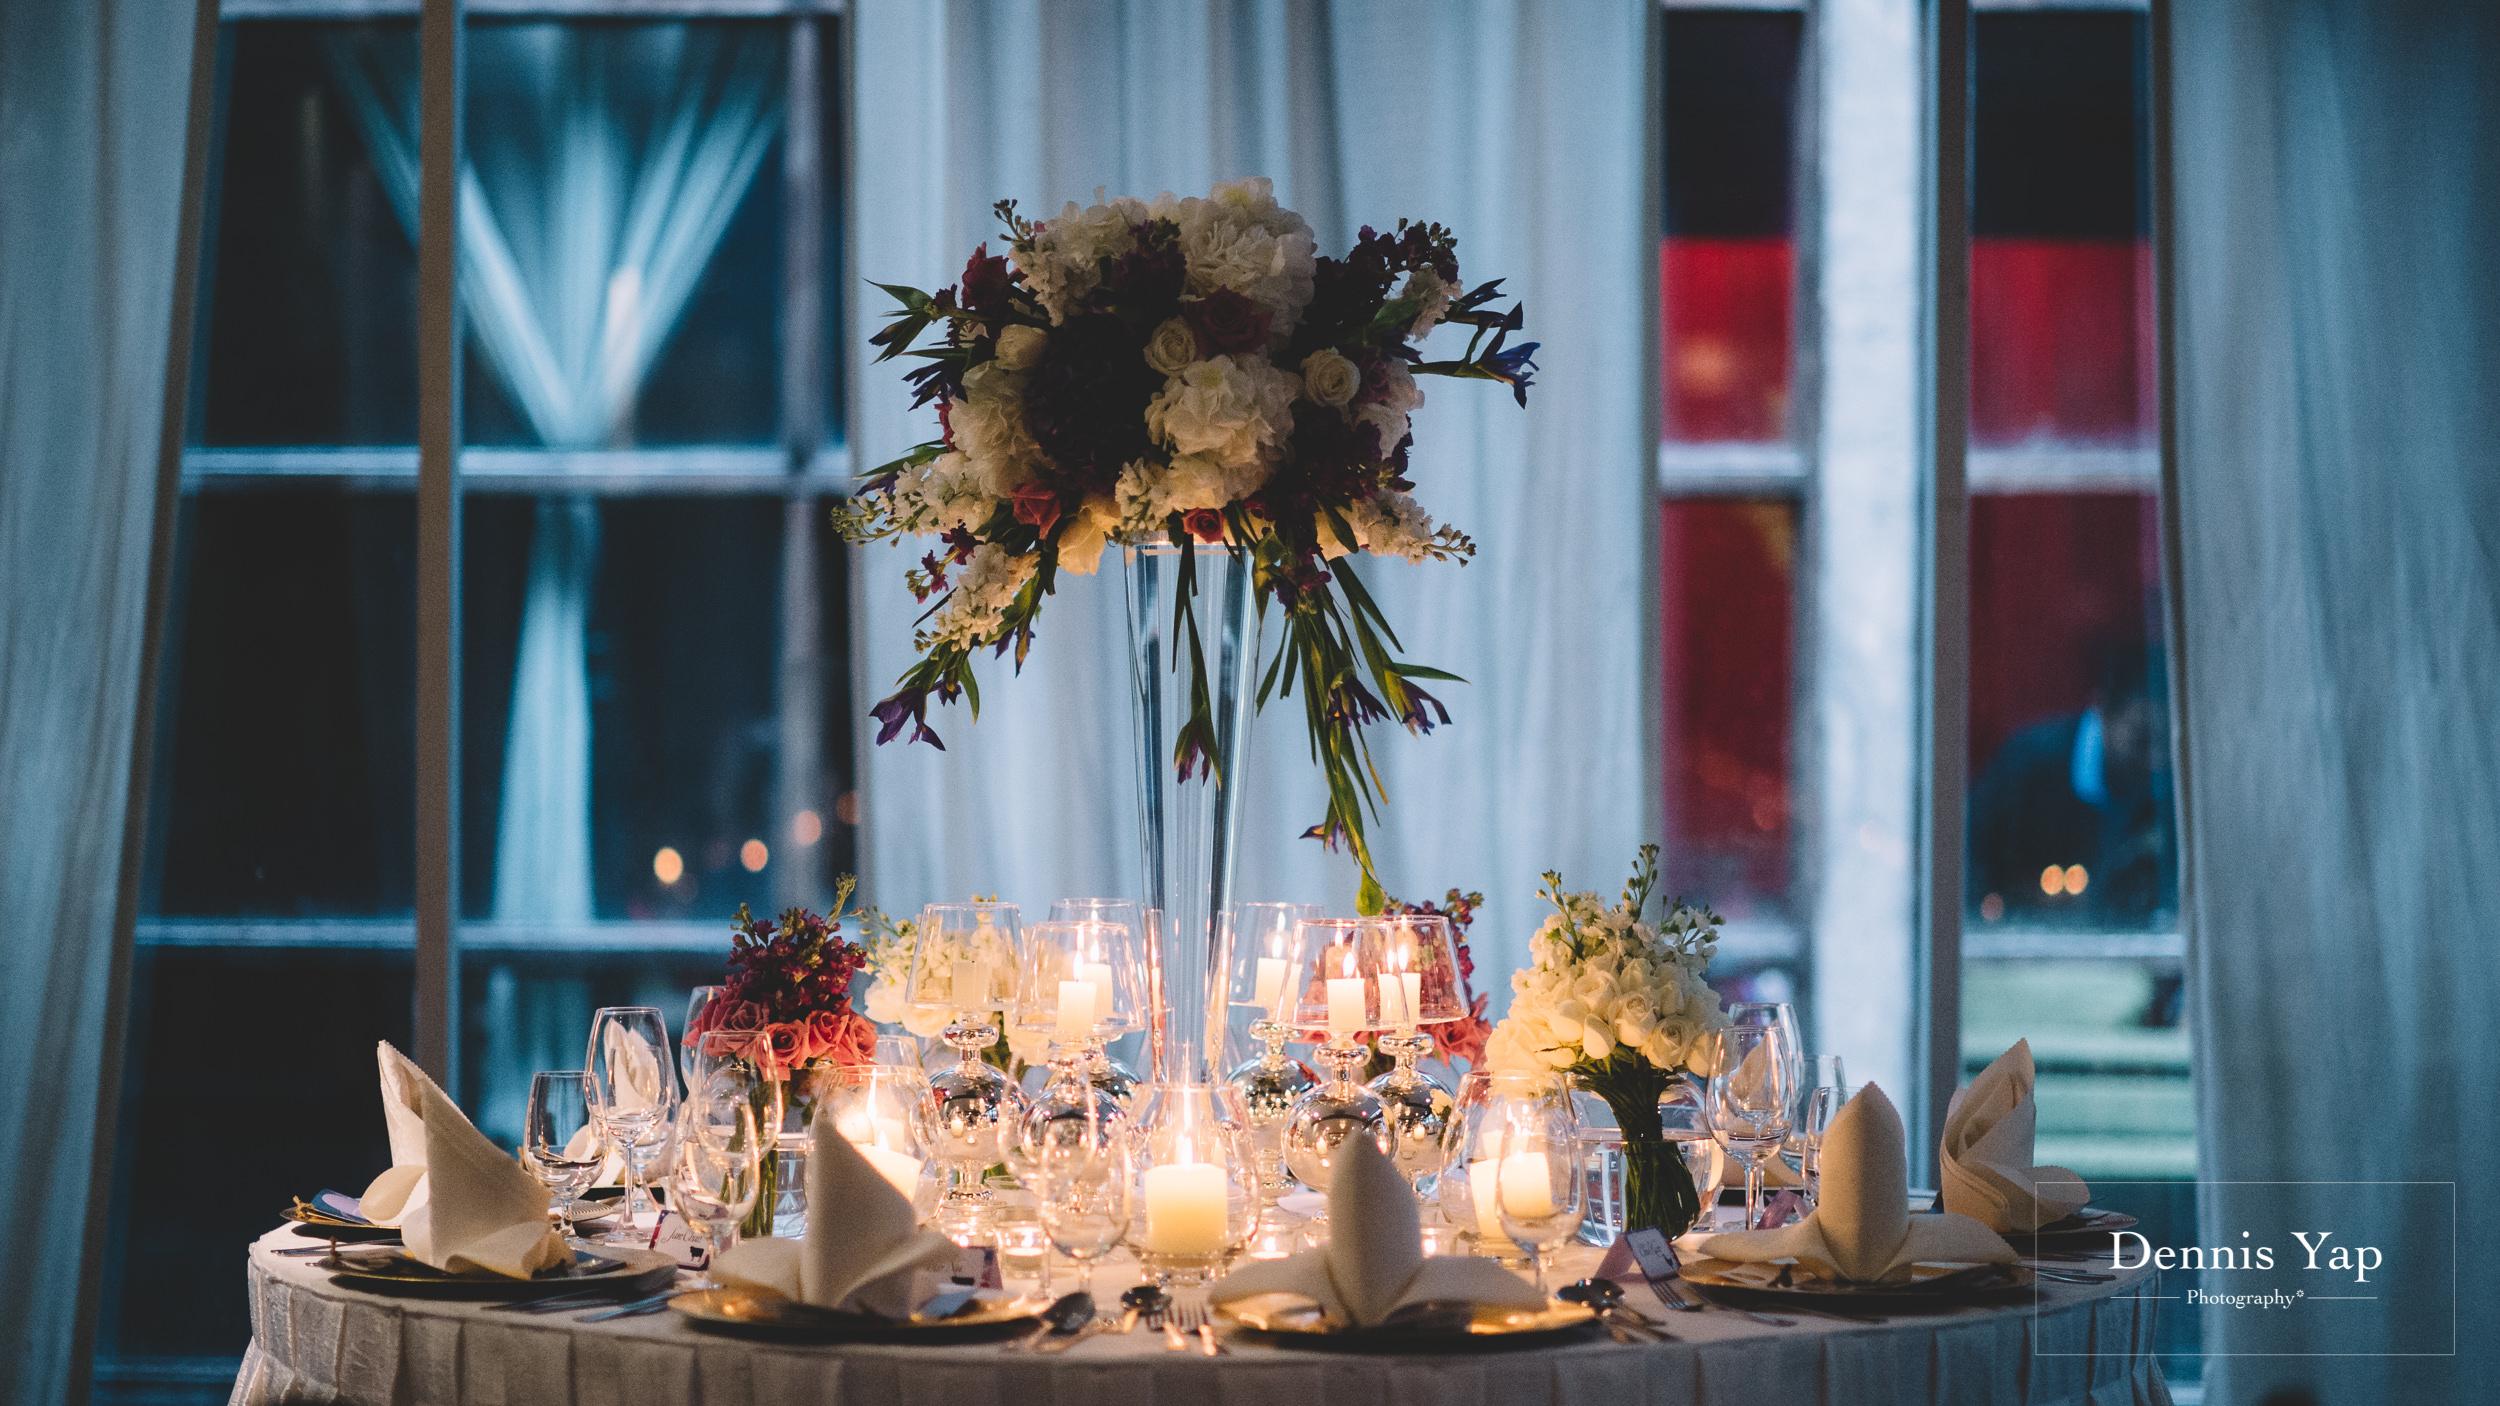 vincent peggy wedding dinner neo tamarind kuala lumpur dennis yap photography-17.jpg